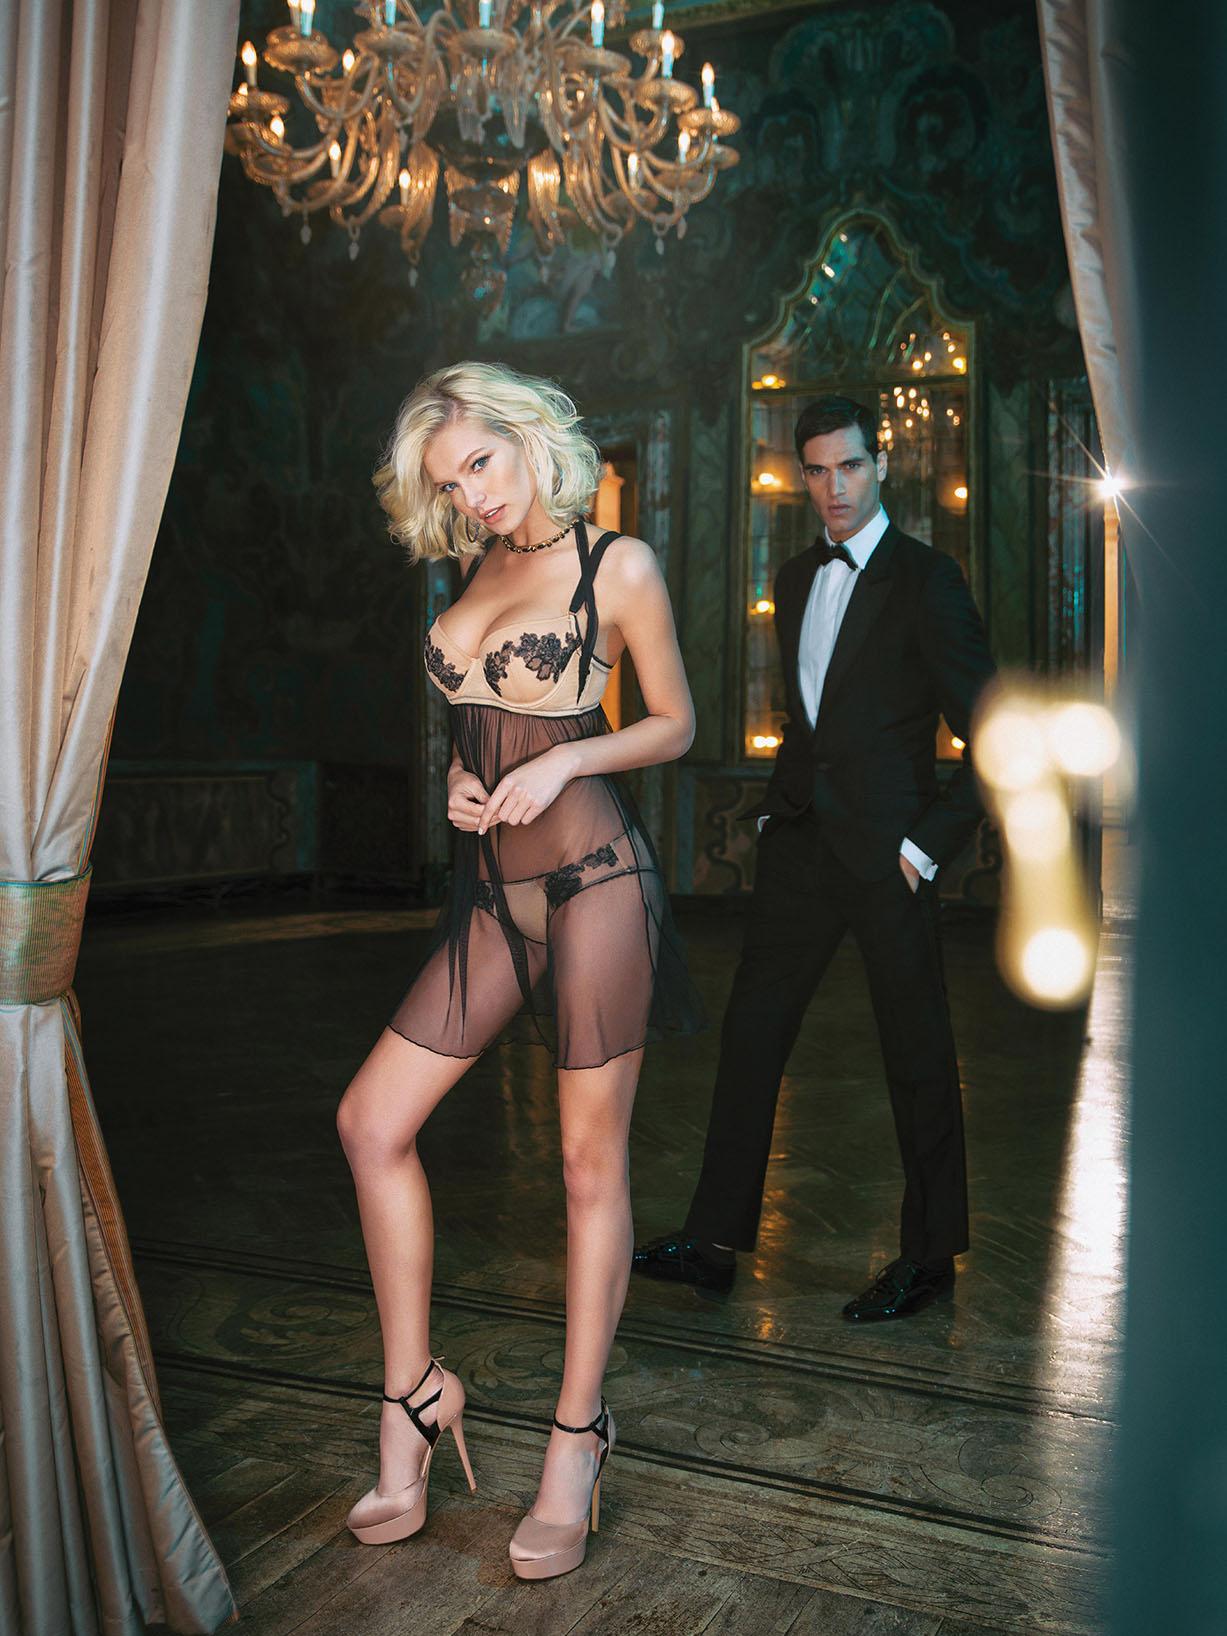 Gintare Sudziute / Гинтаре Судзюте в нижнем белье Incanto Very Sexy 2016